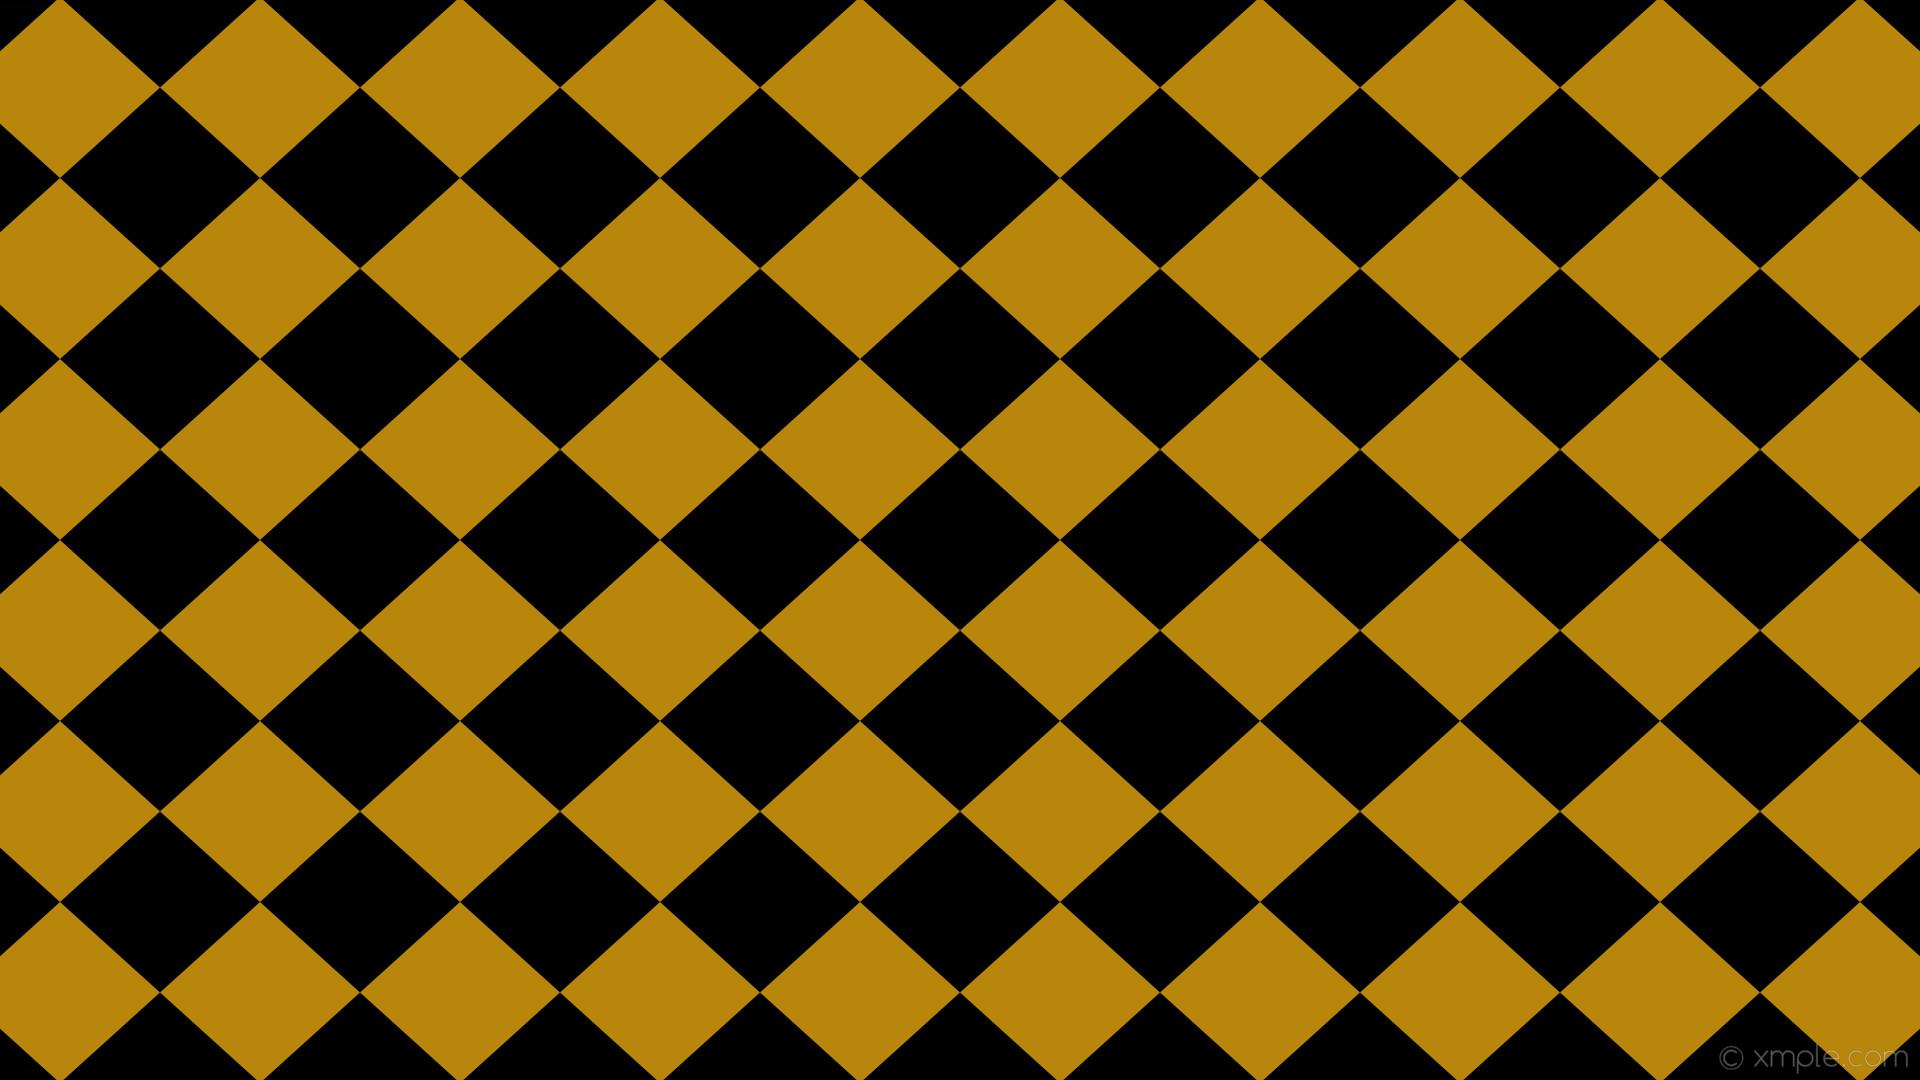 Res: 1920x1080, wallpaper rhombus brown black diamond lozenge dark goldenrod #000000  #b8860b 0° 200px 181px